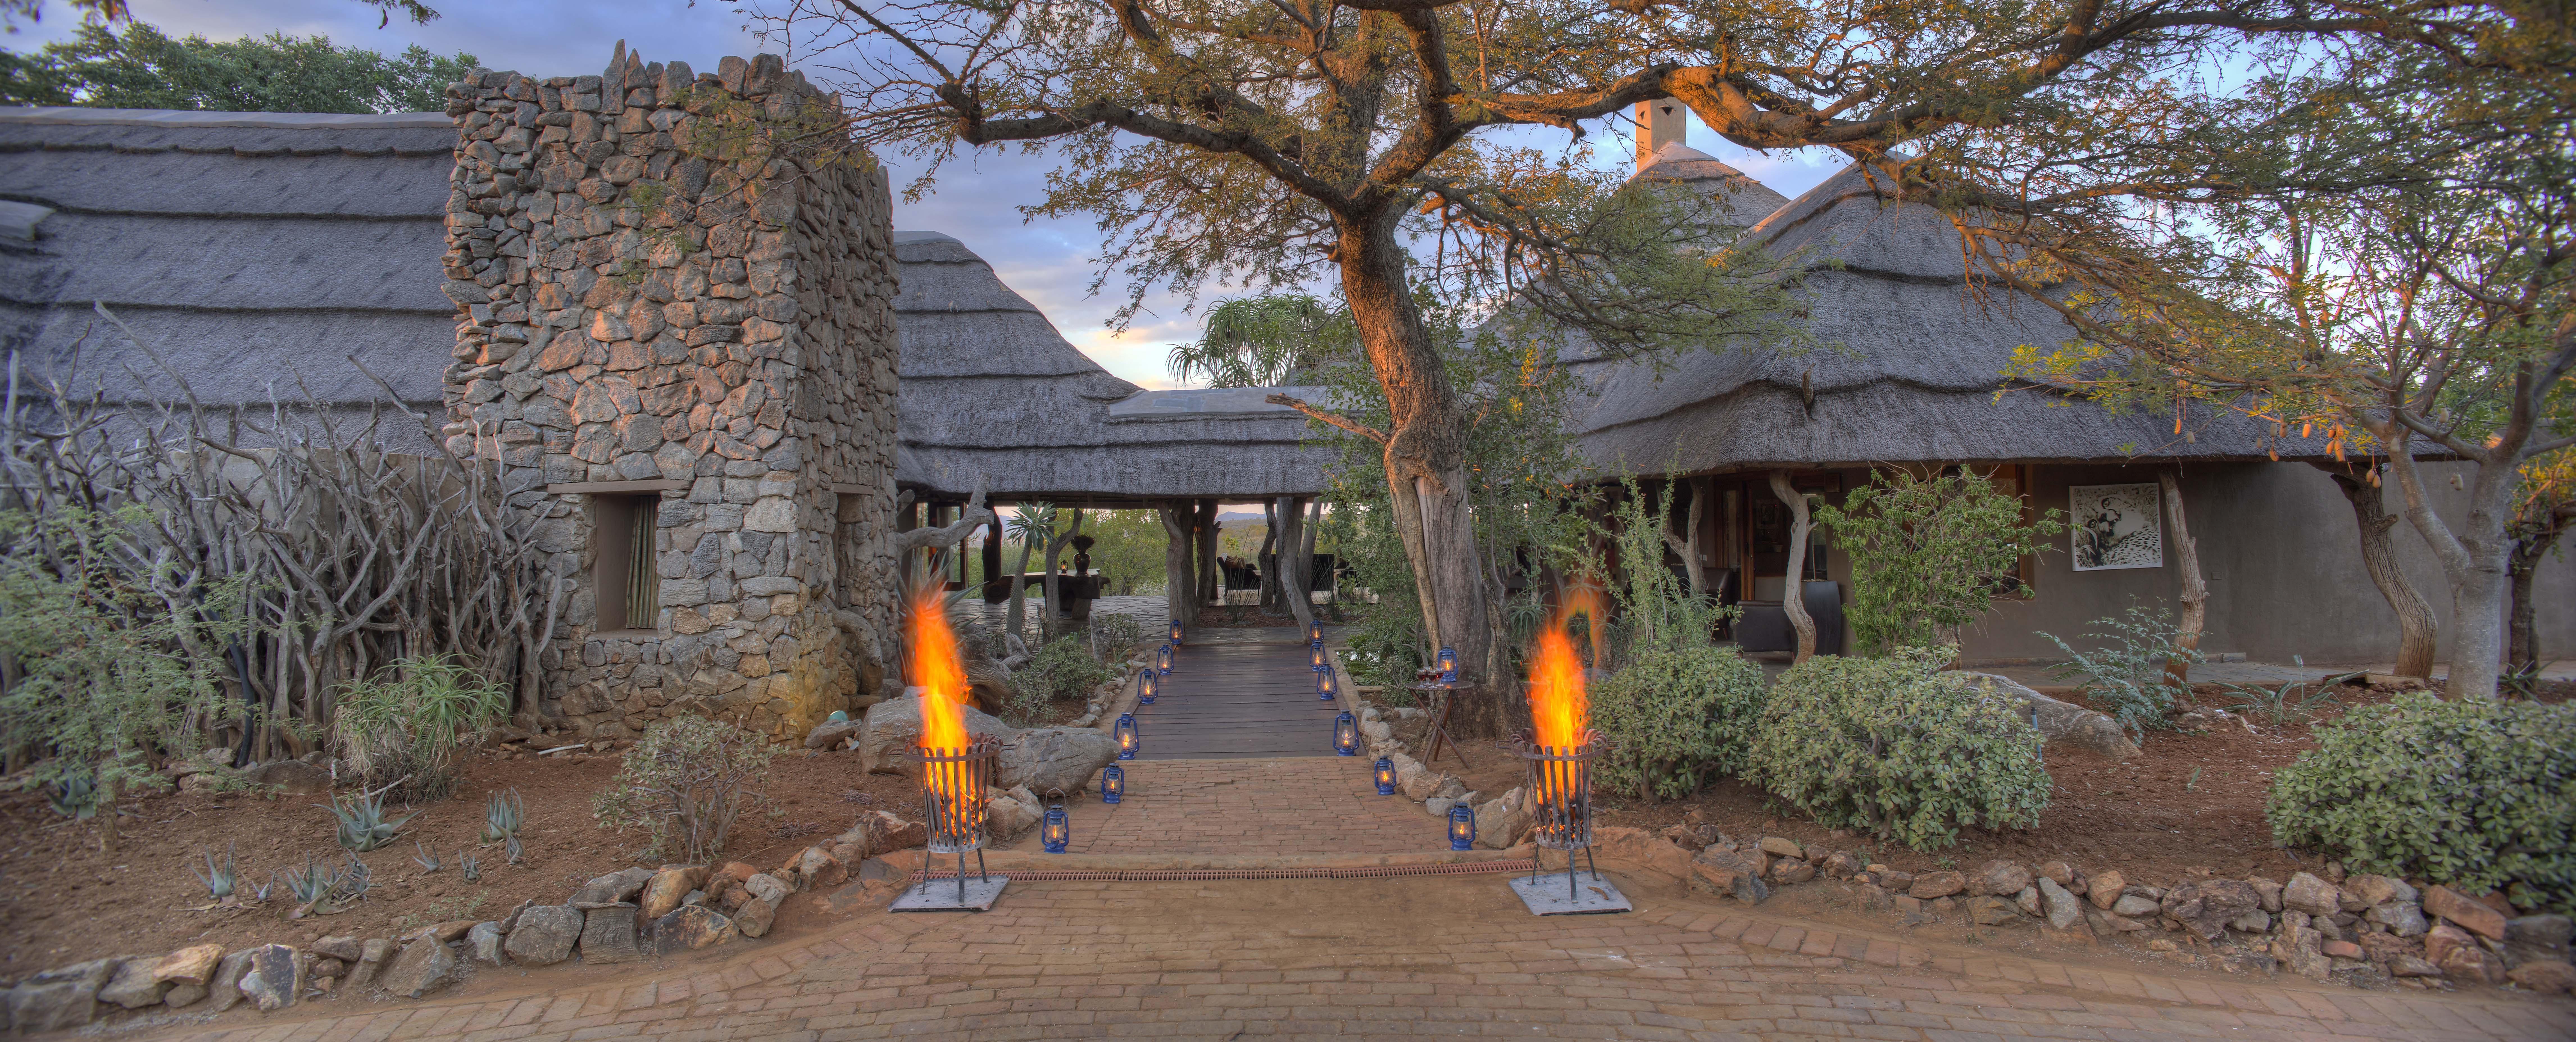 Entrance to the safari lodge